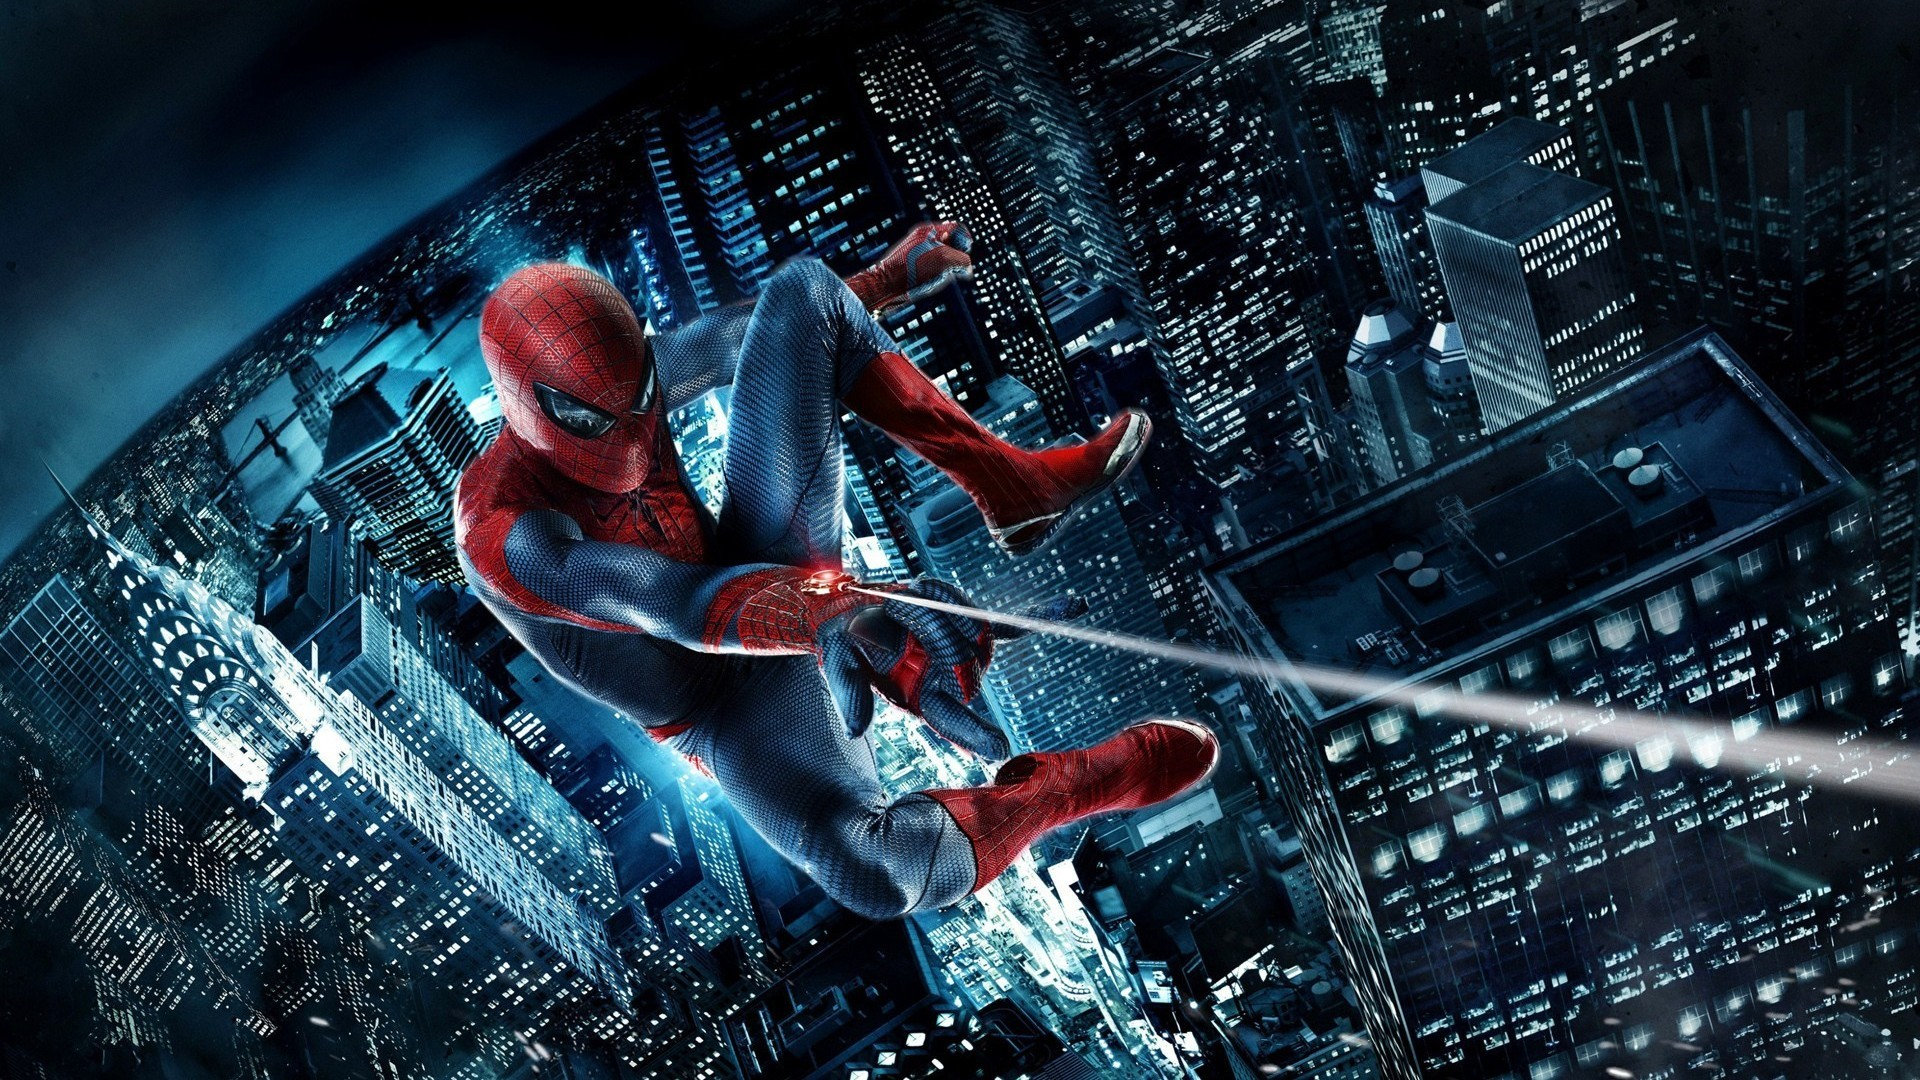 spiderman wallpaper hd ·① download free hd wallpapers for desktop